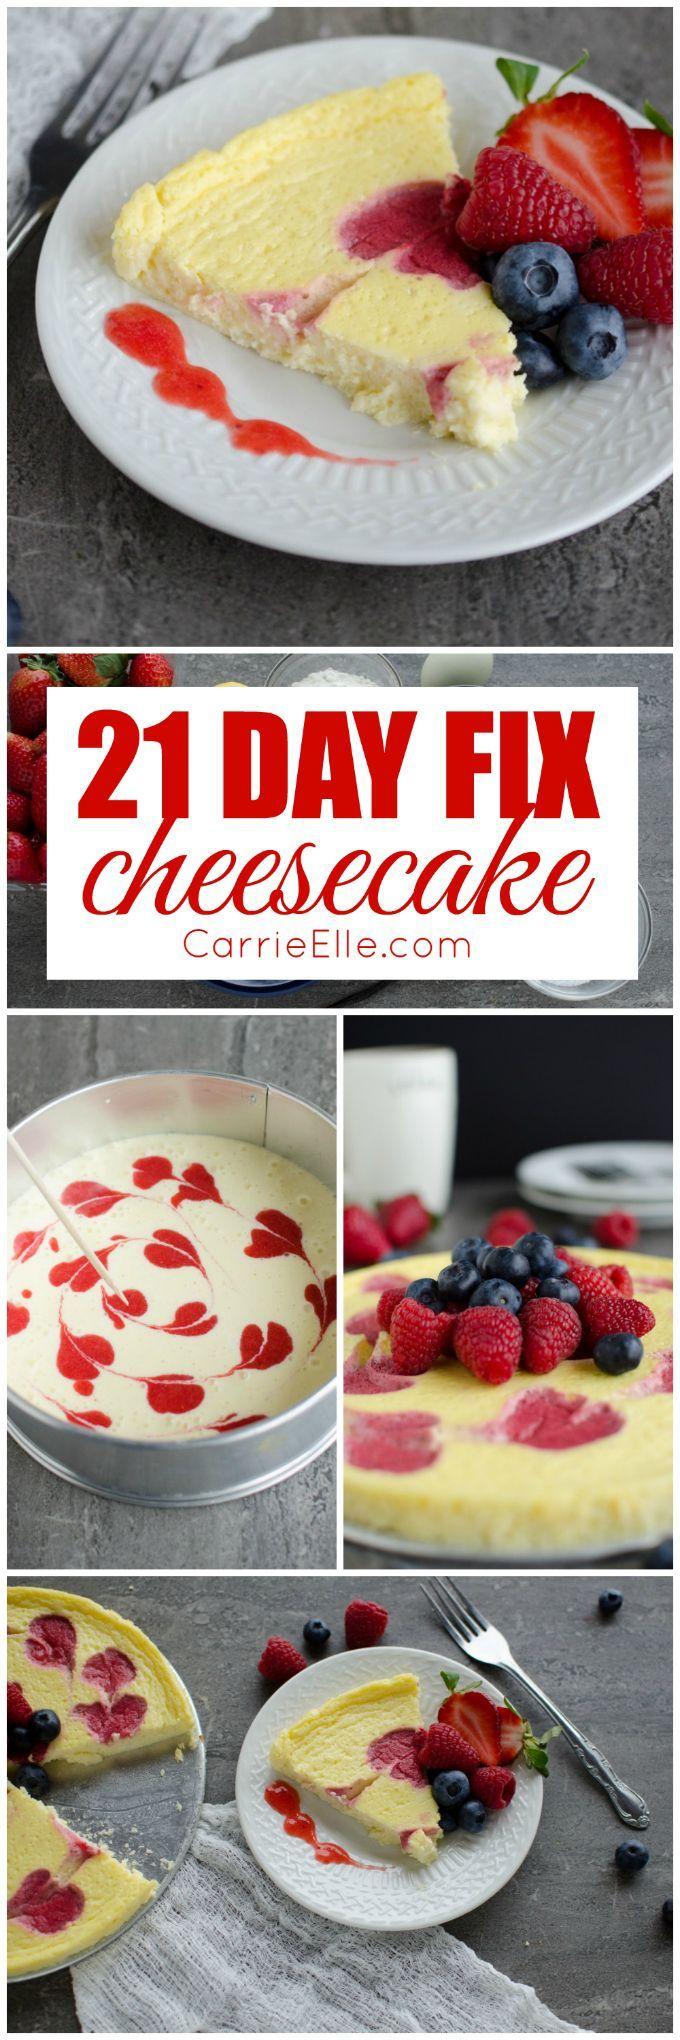 21 Day Fix Cheesecake